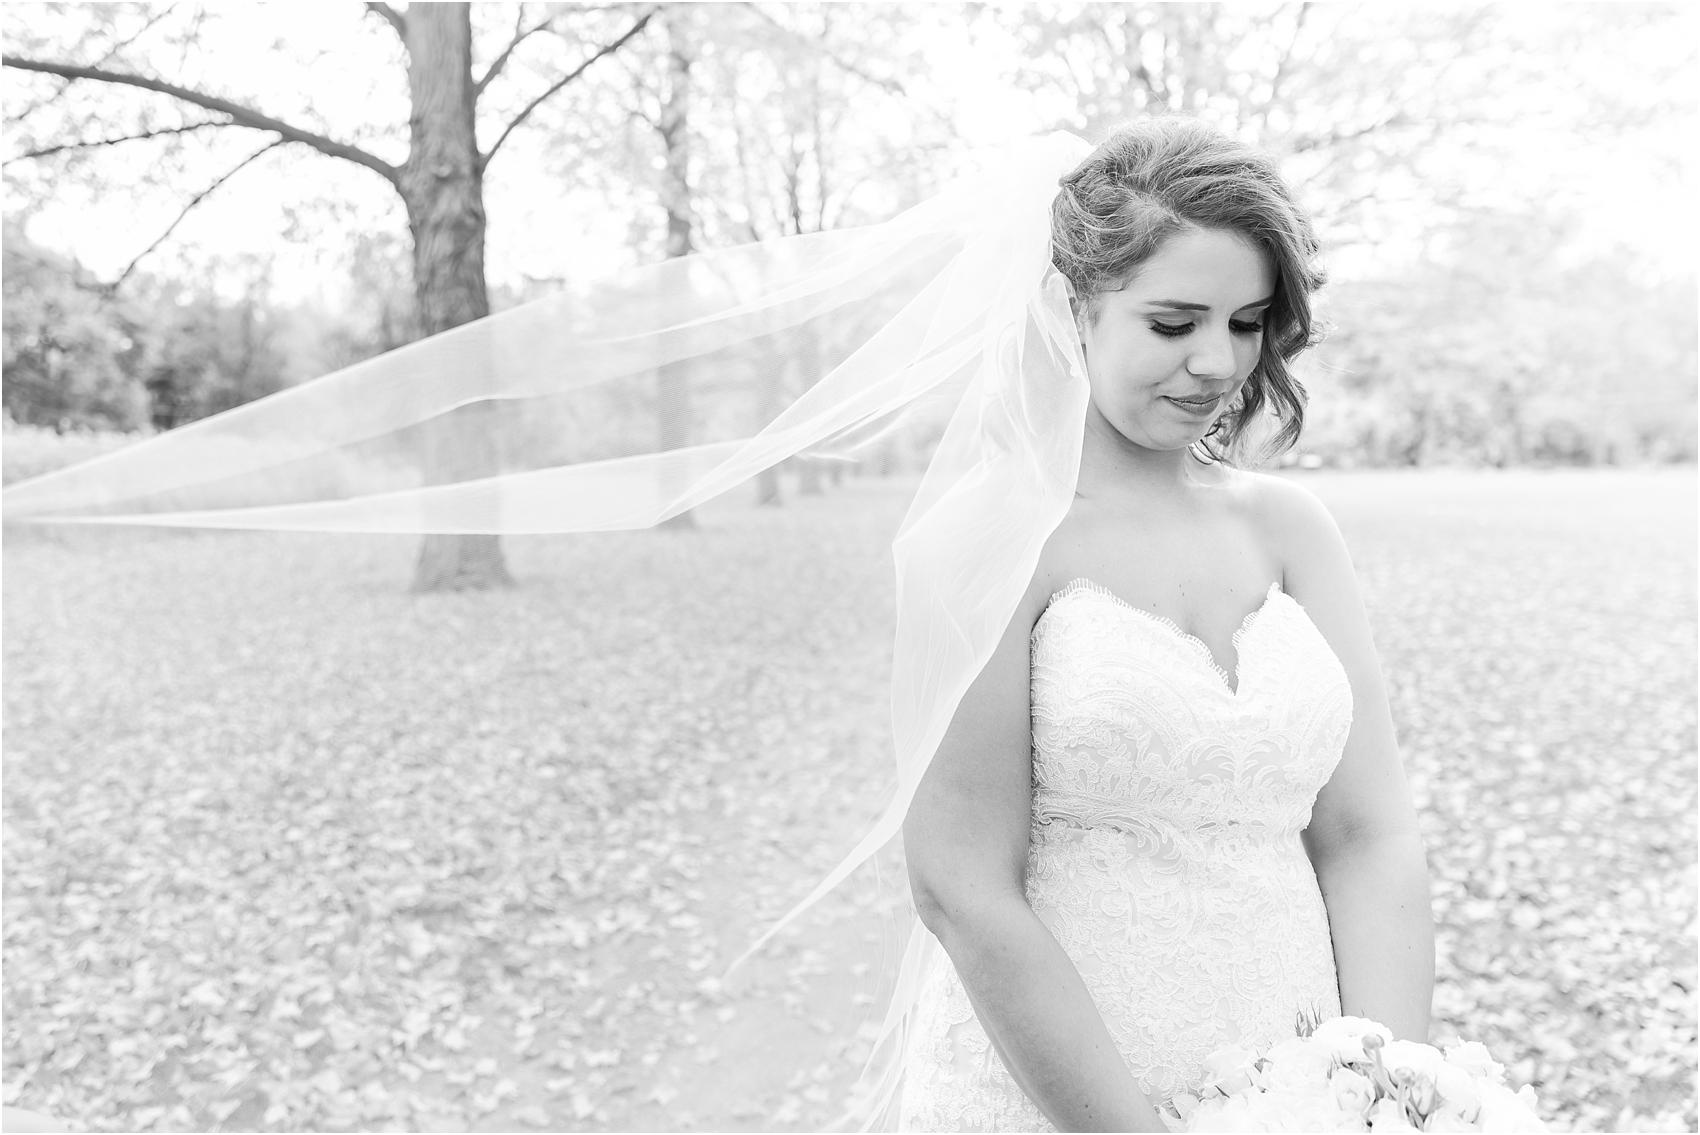 elegant-and-romantic-fall-wedding-photos-at-st-marys-catholic-church-in-monroe-michigan-by-courtney-carolyn-photography_0056.jpg